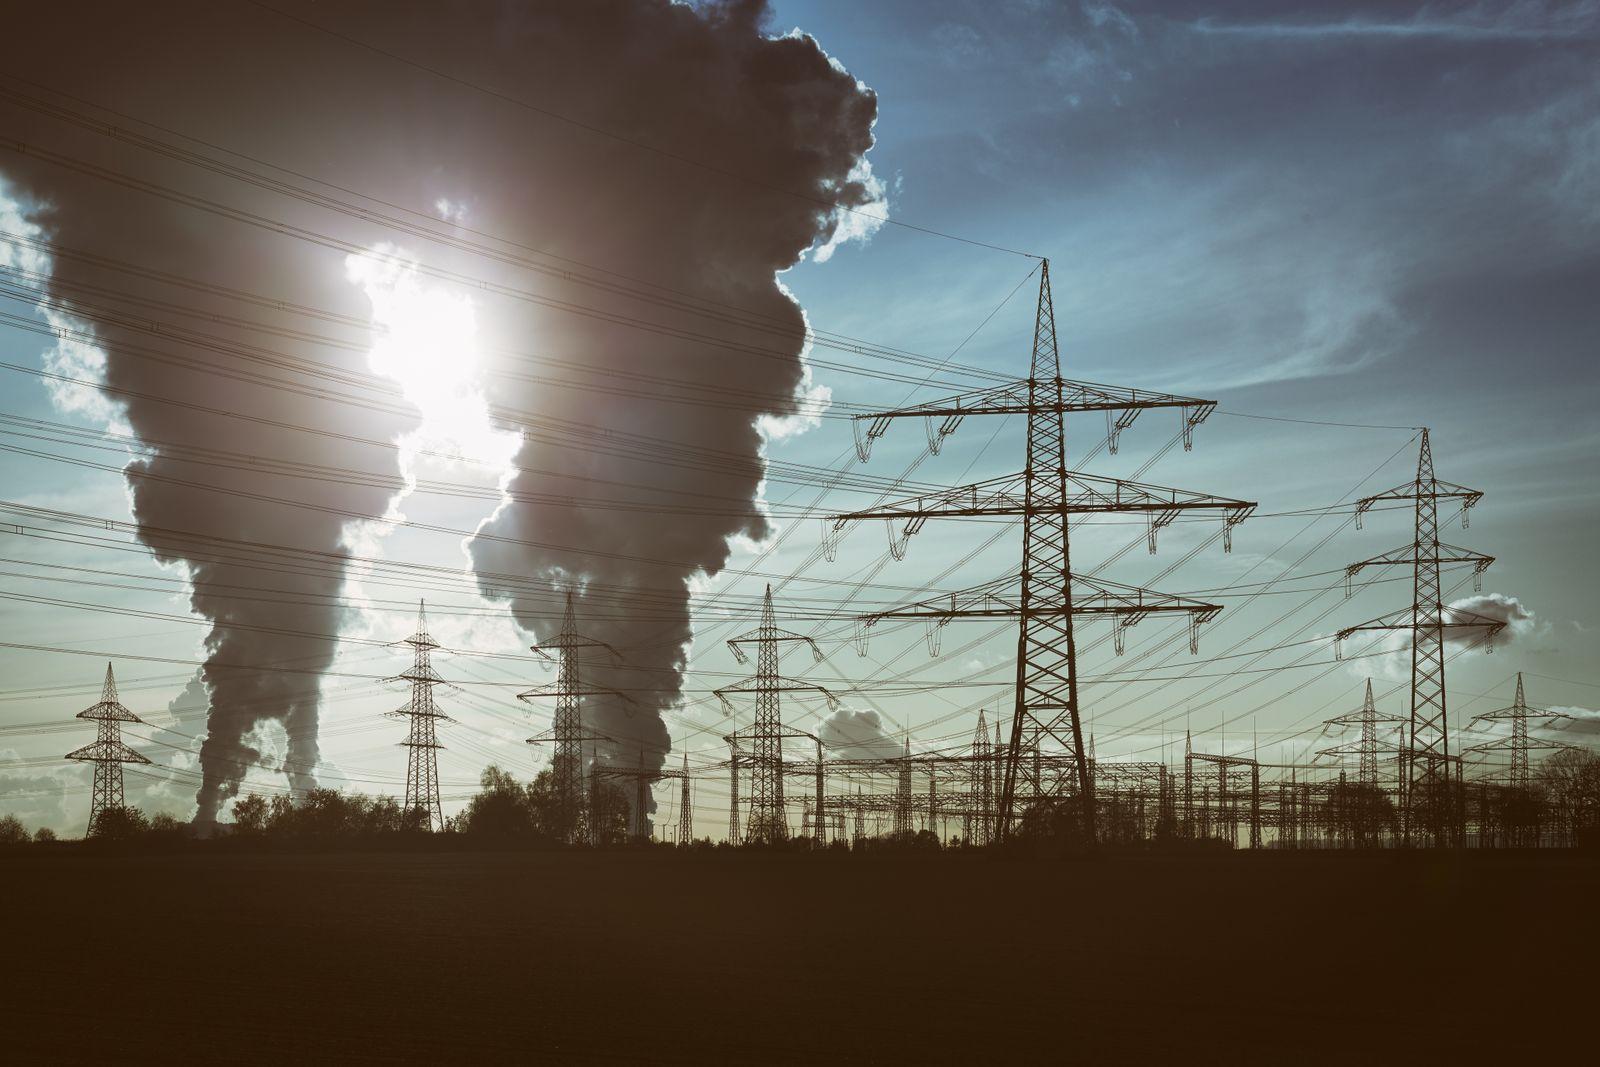 EINMALIGE VERWENDUNG Symbolbild Klima/ Klimaerwärmung/ Klimawandel/ Kohle/ Kohlekraft